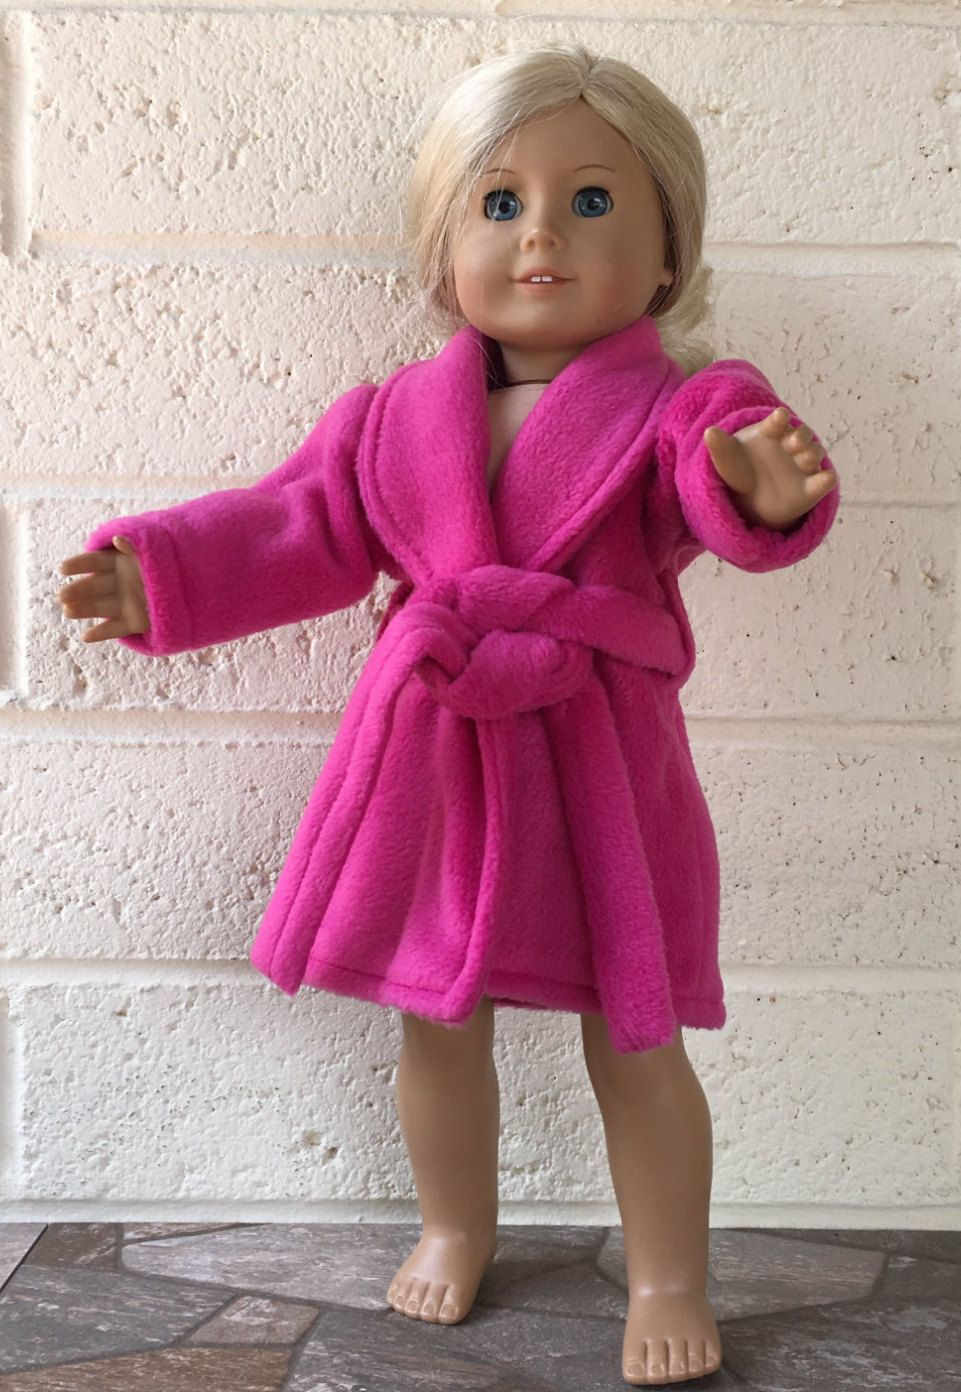 18 inch doll robe girl doll clothes 18 inch doll